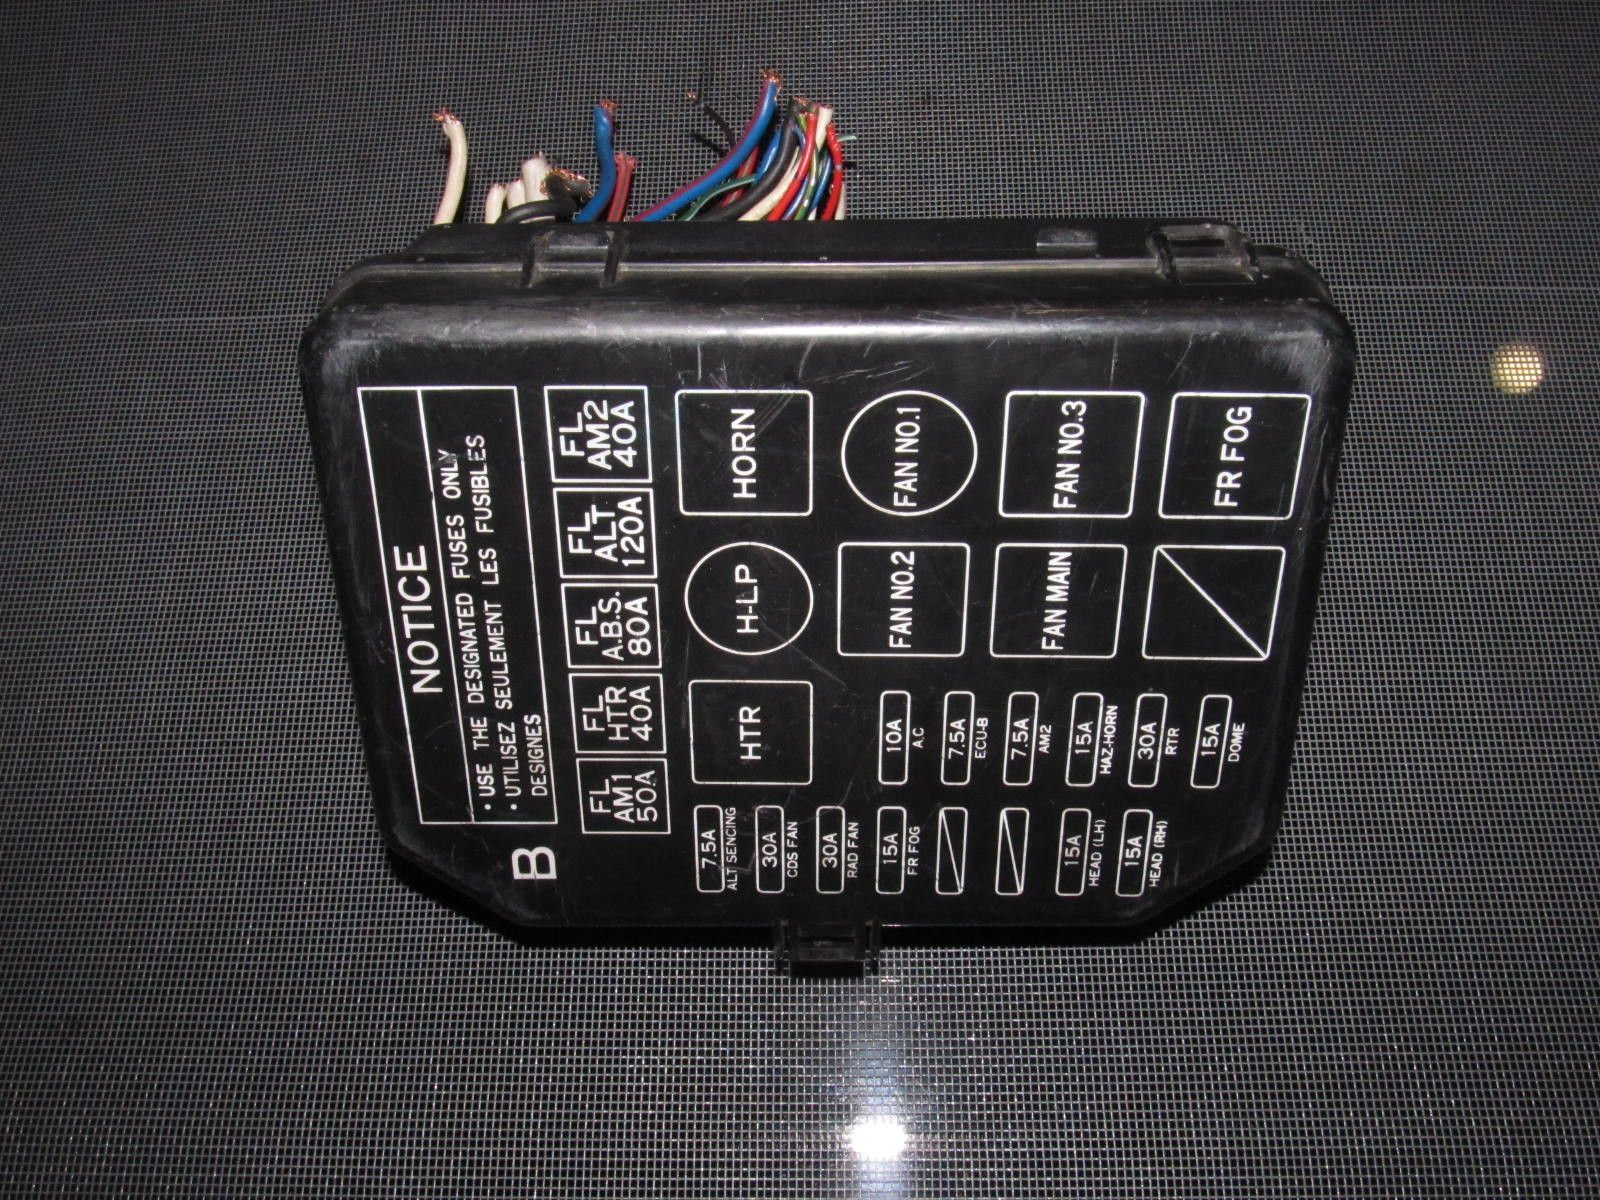 91 95 toyota mr2 oem interior fuse box [ 1600 x 1200 Pixel ]